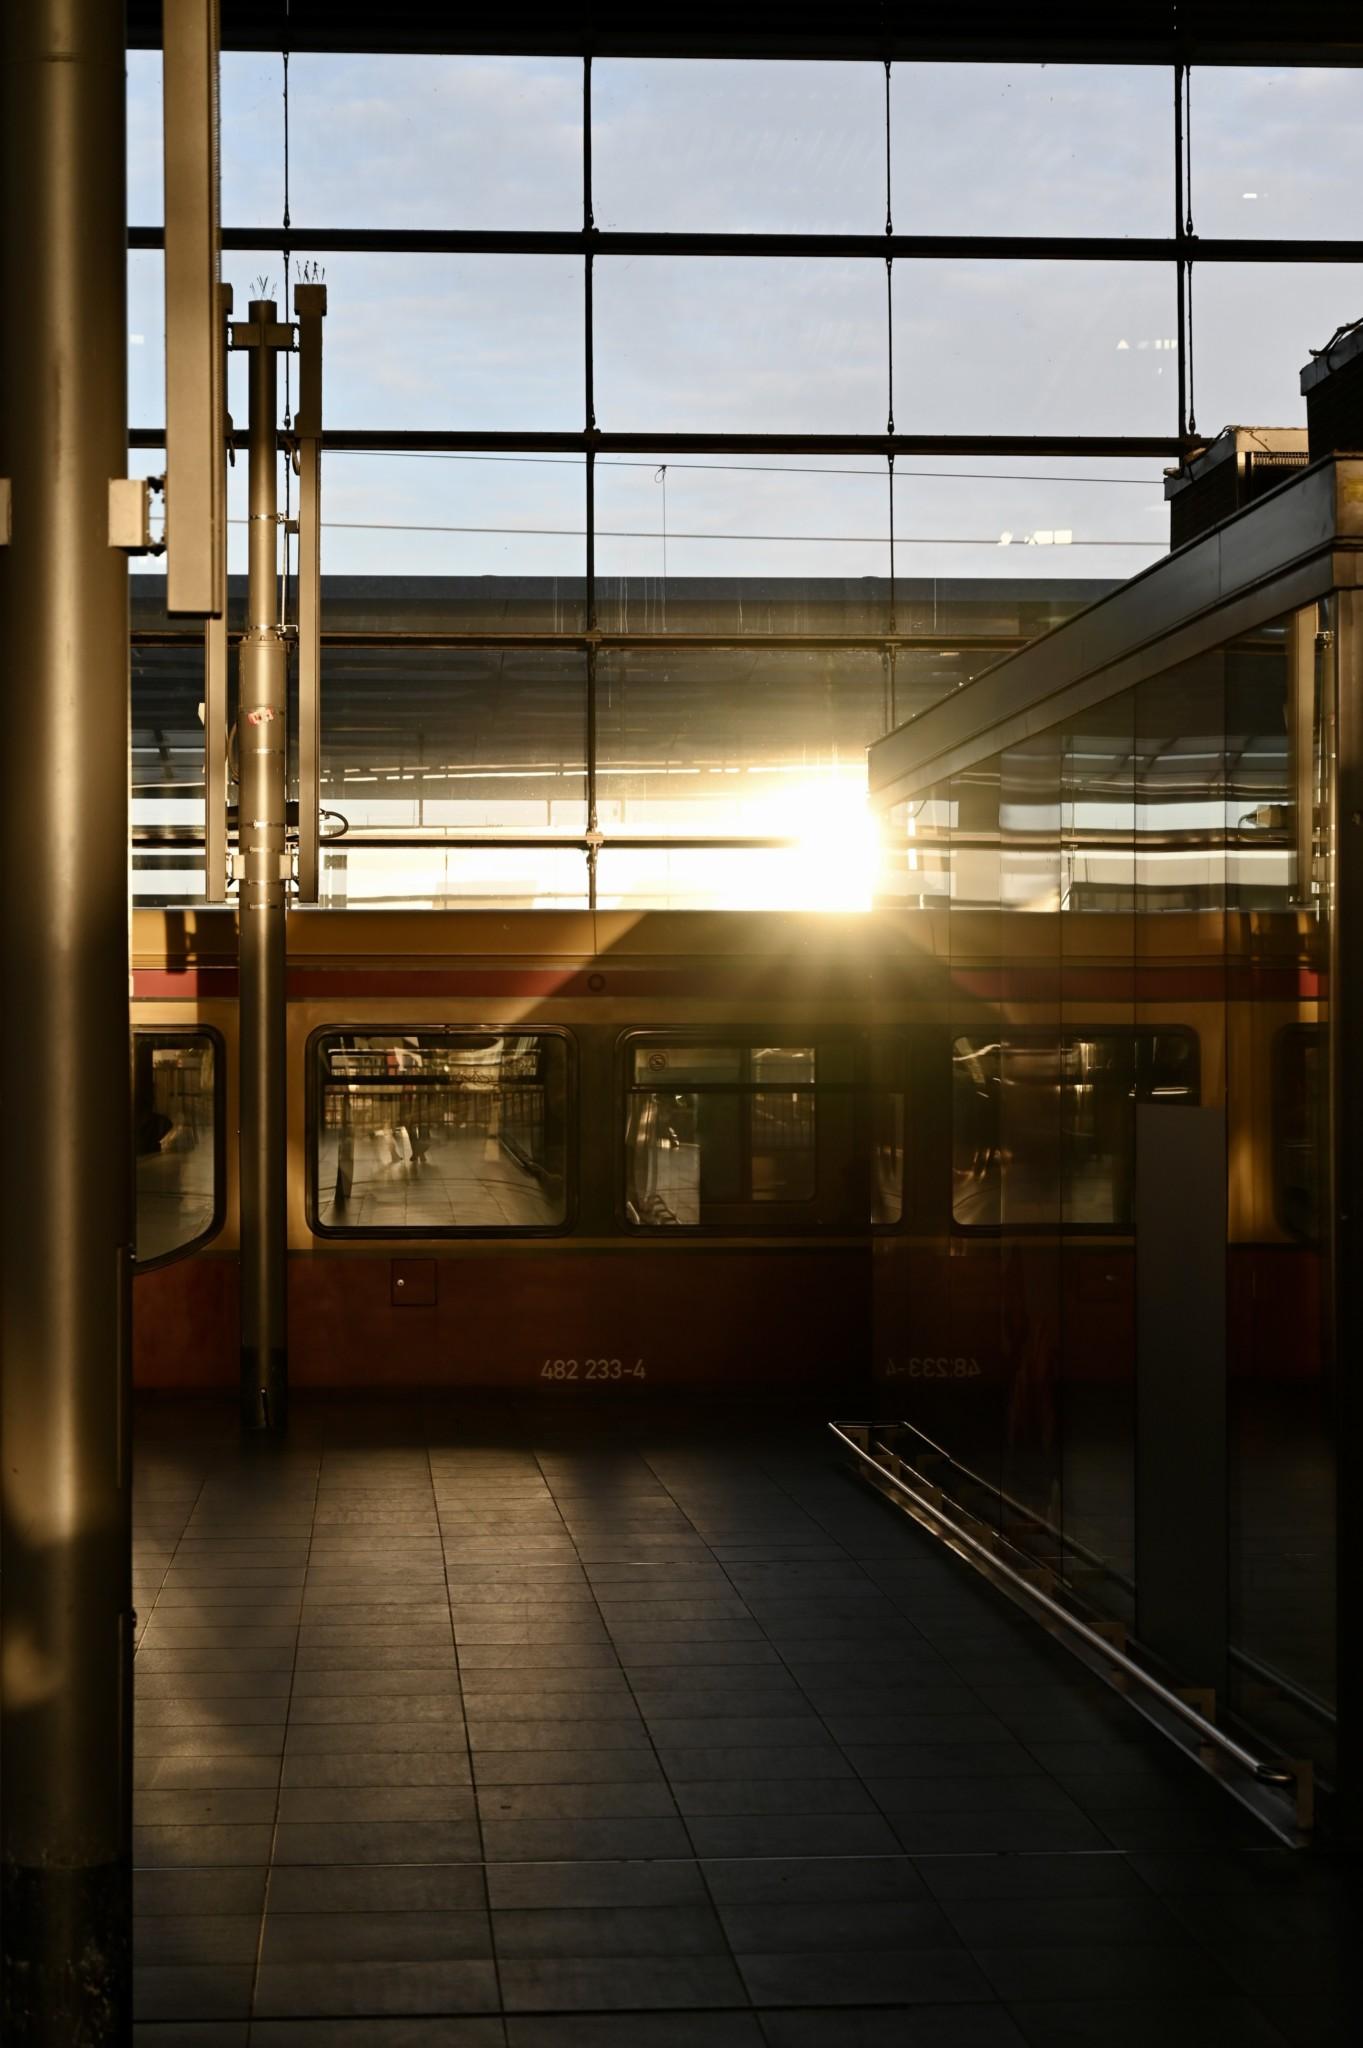 Berlin-Ostkreuz